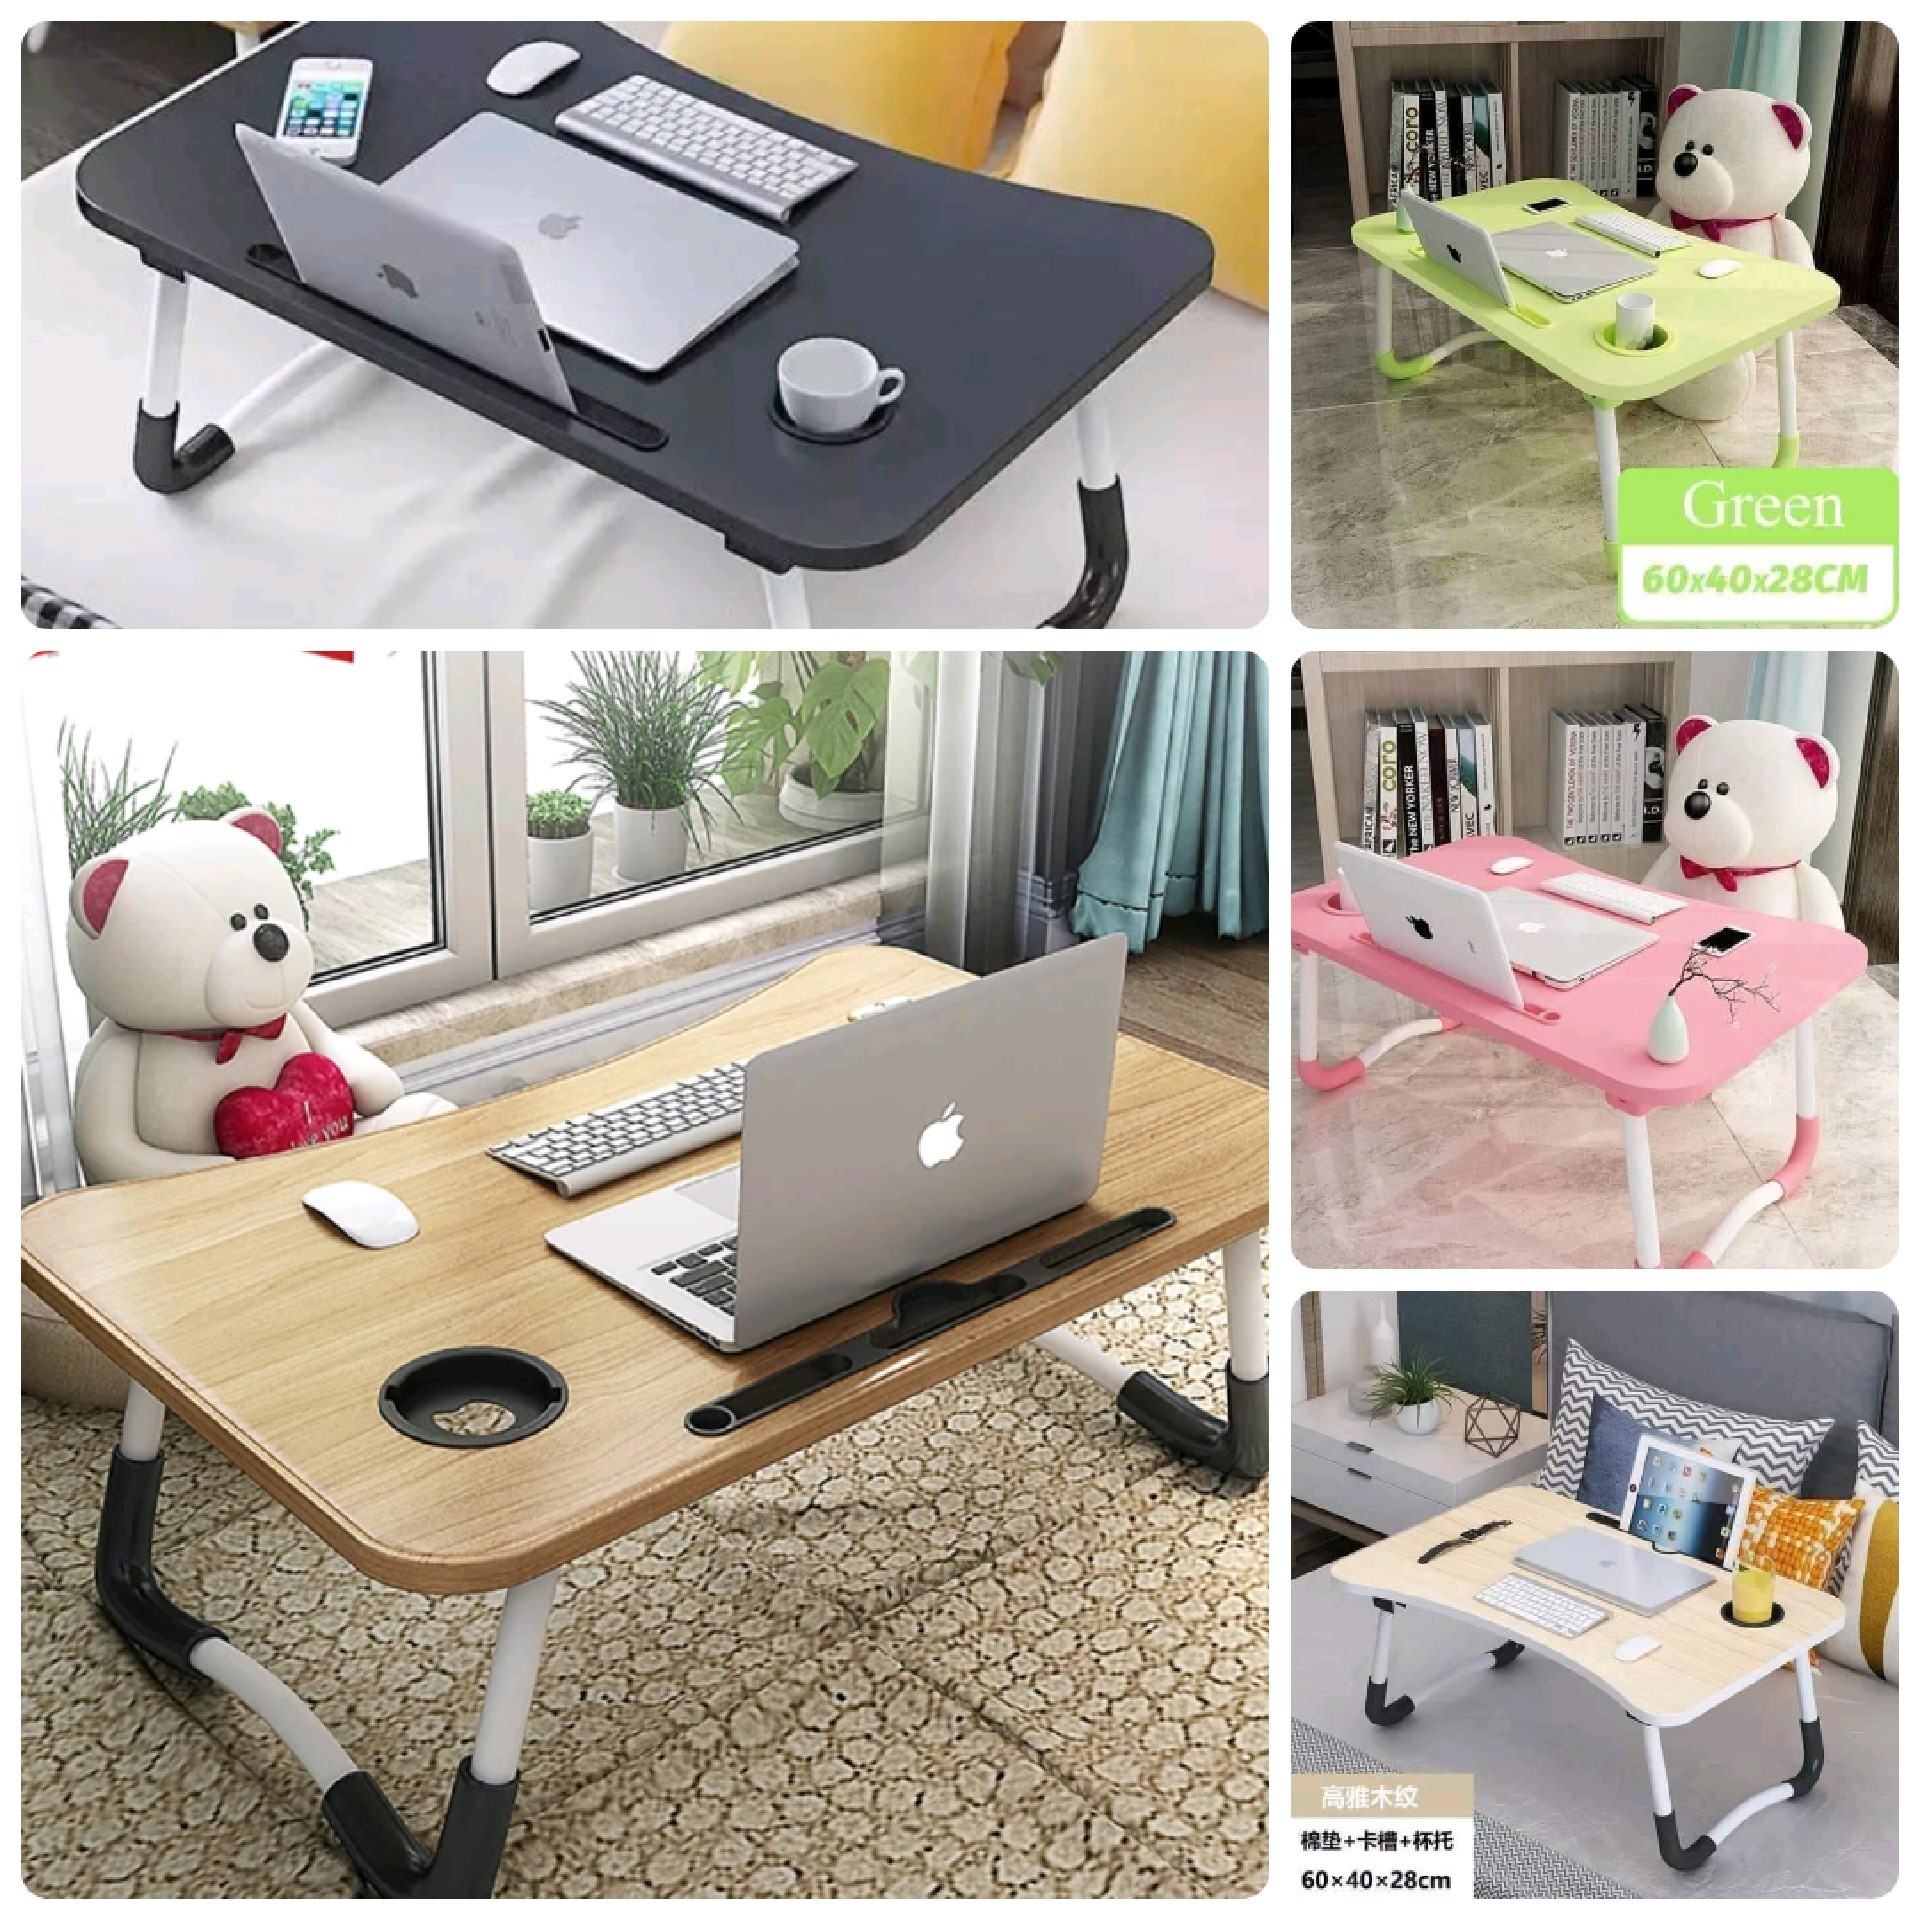 Multifunctional Foldable laptop Desk For Bed